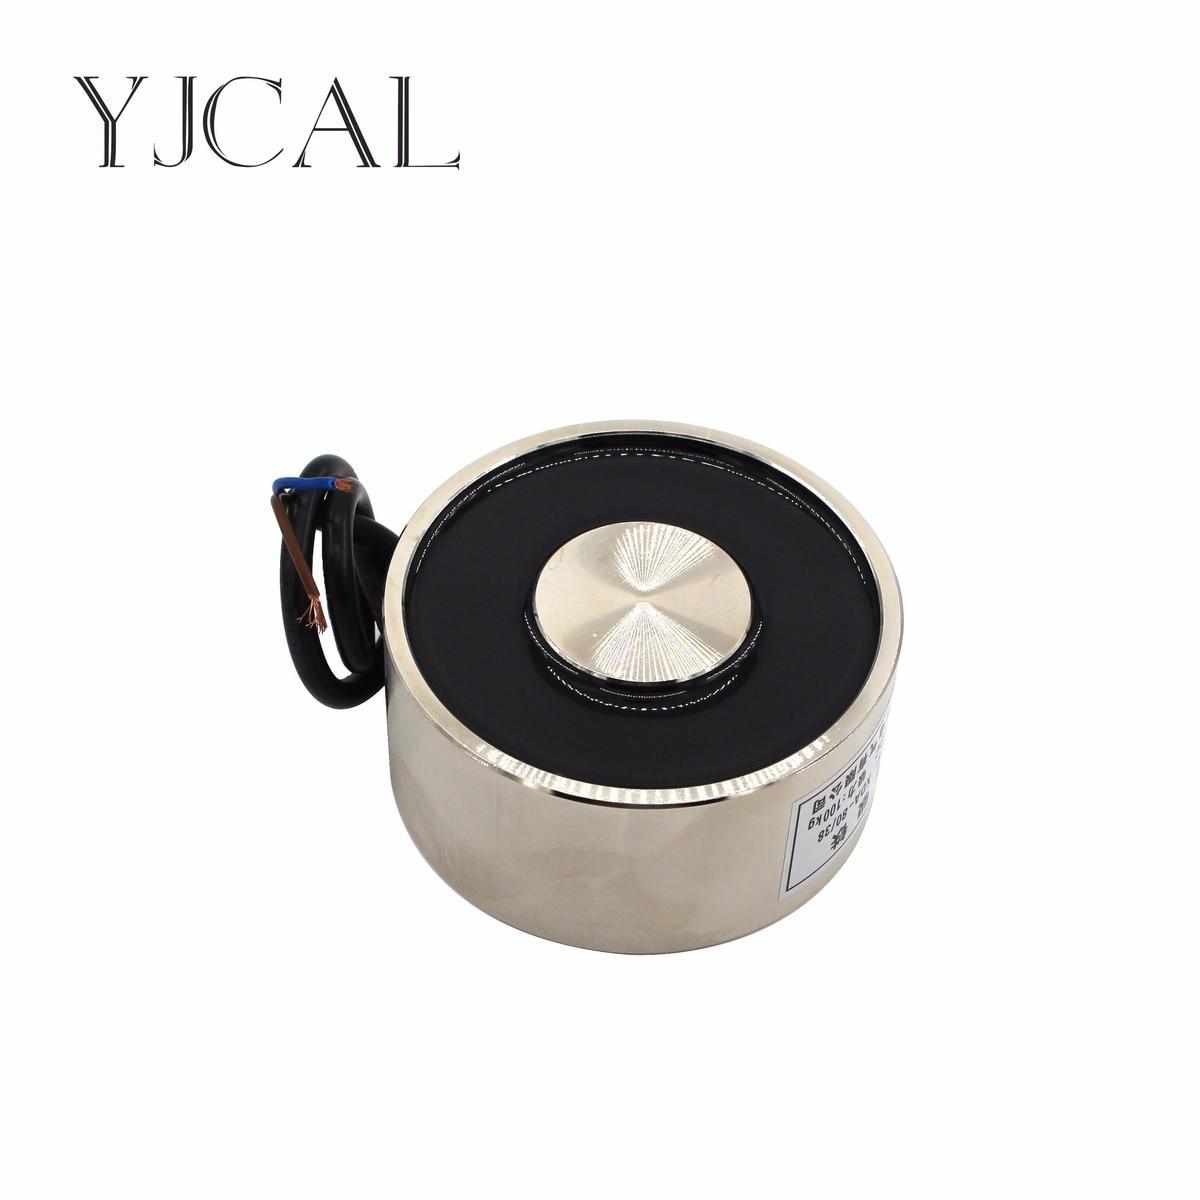 YJ- 80/38 DC 12V 24V Circular Micro Holding Electric Magnet Lifting 100KG Solenoid Sucker Electromagnet